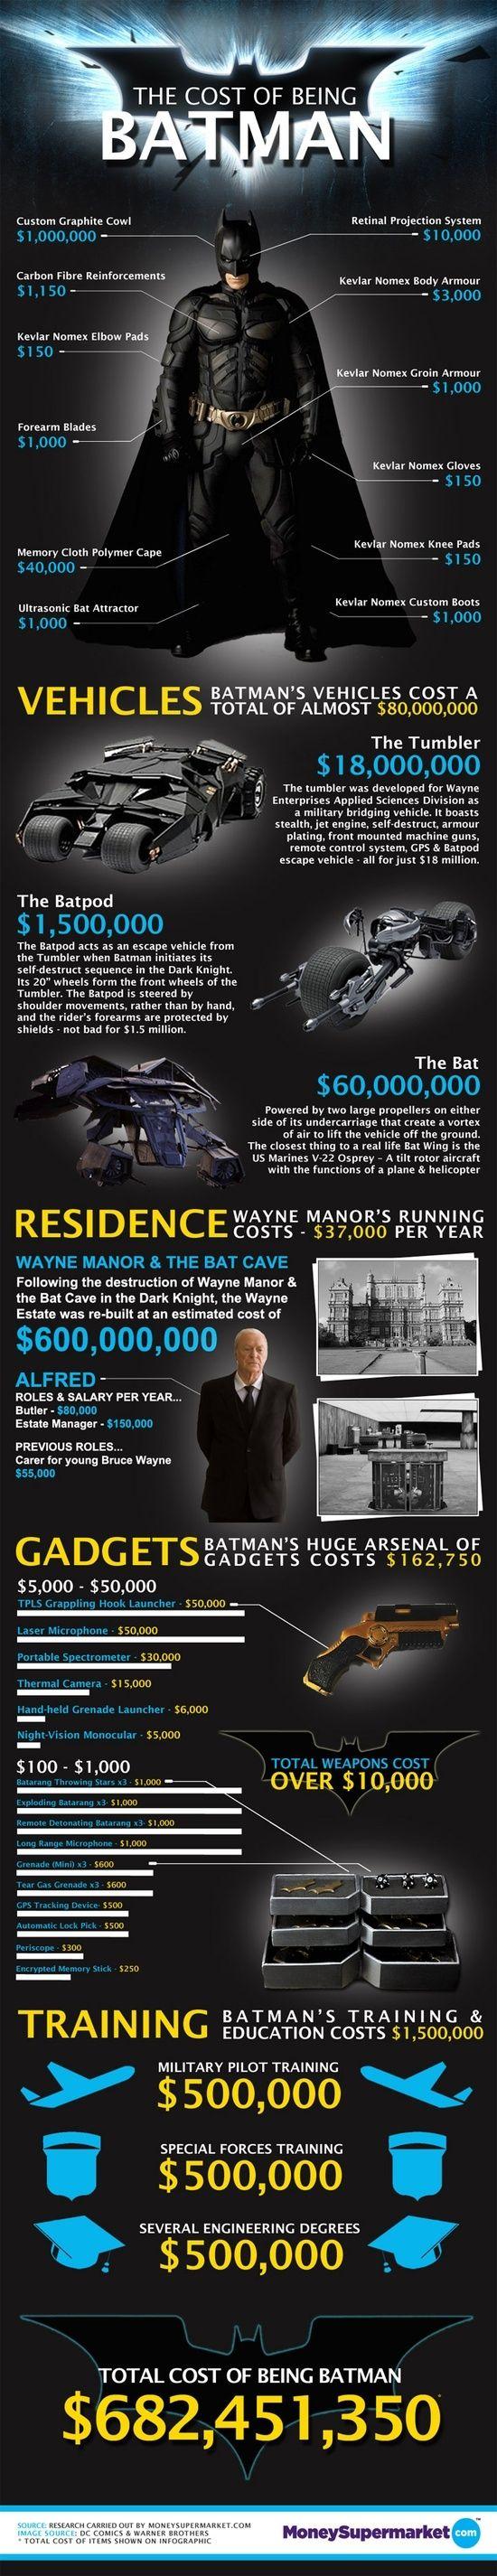 The Cost of Being Batman by moneysupermarket.com #Batman